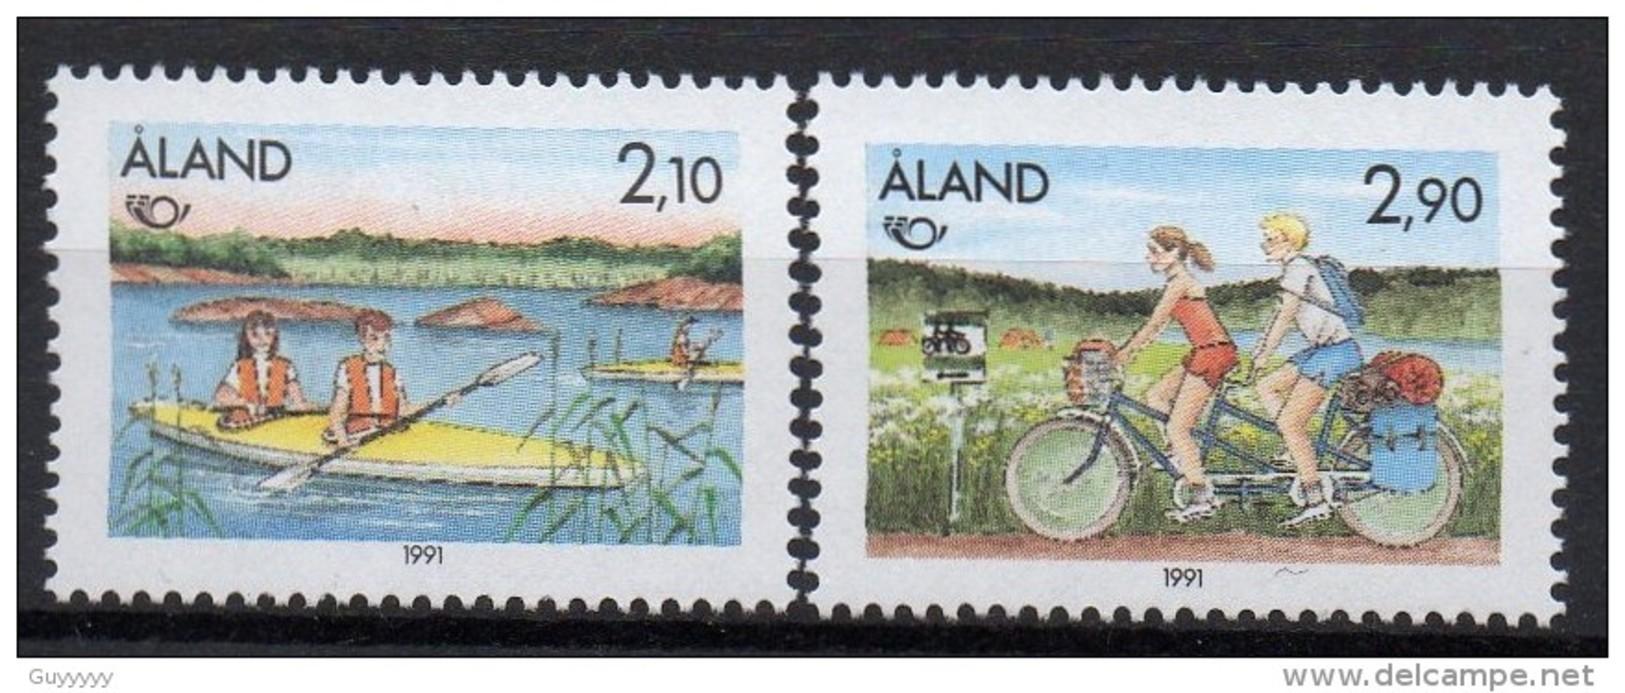 Aland - 1991 - Yvert N° 51 & 52 ** - Norden - Aland